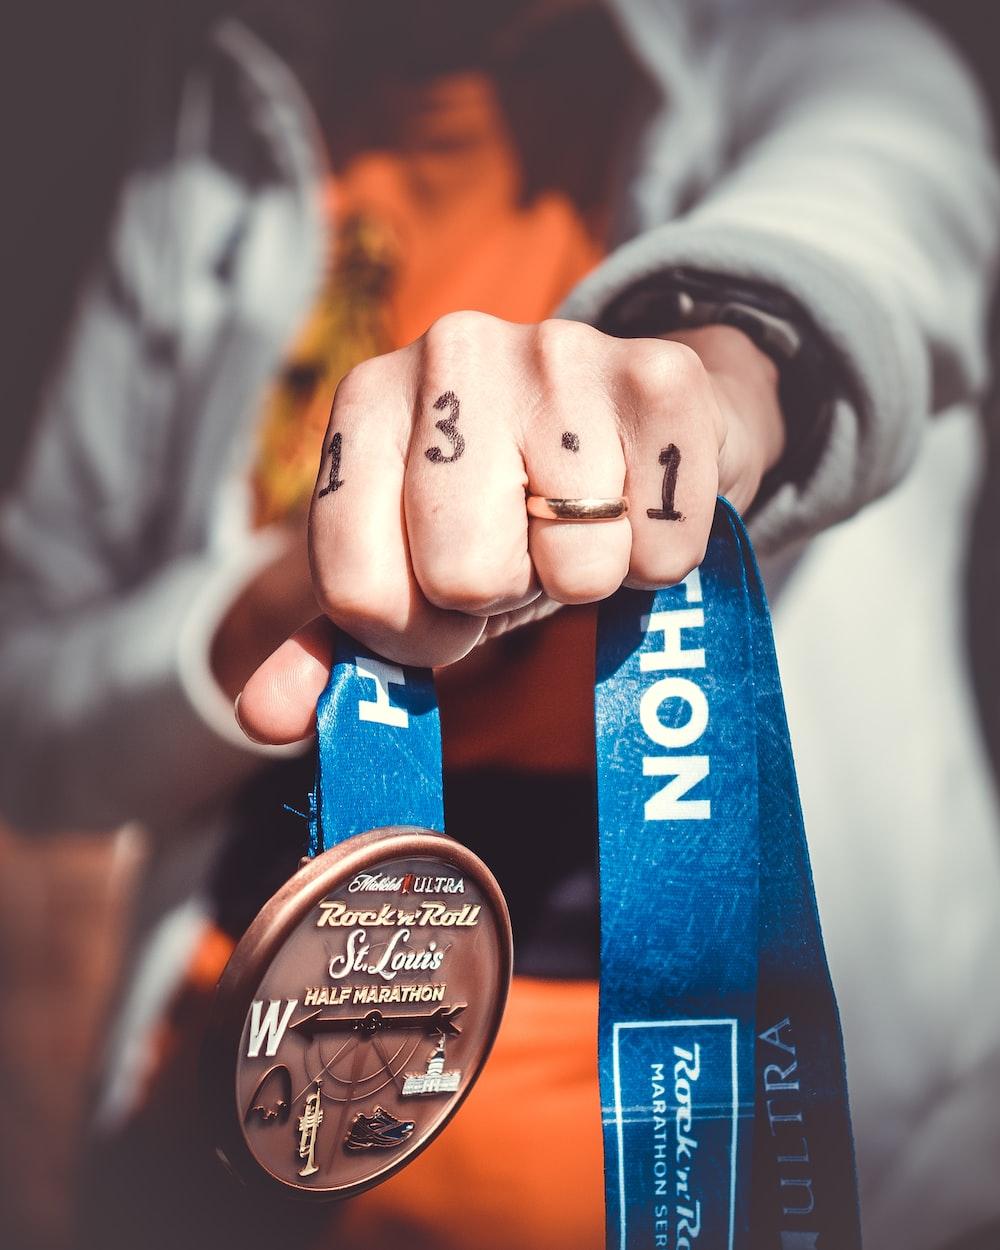 person holding Rock N Roll St. Louis half marathon medal